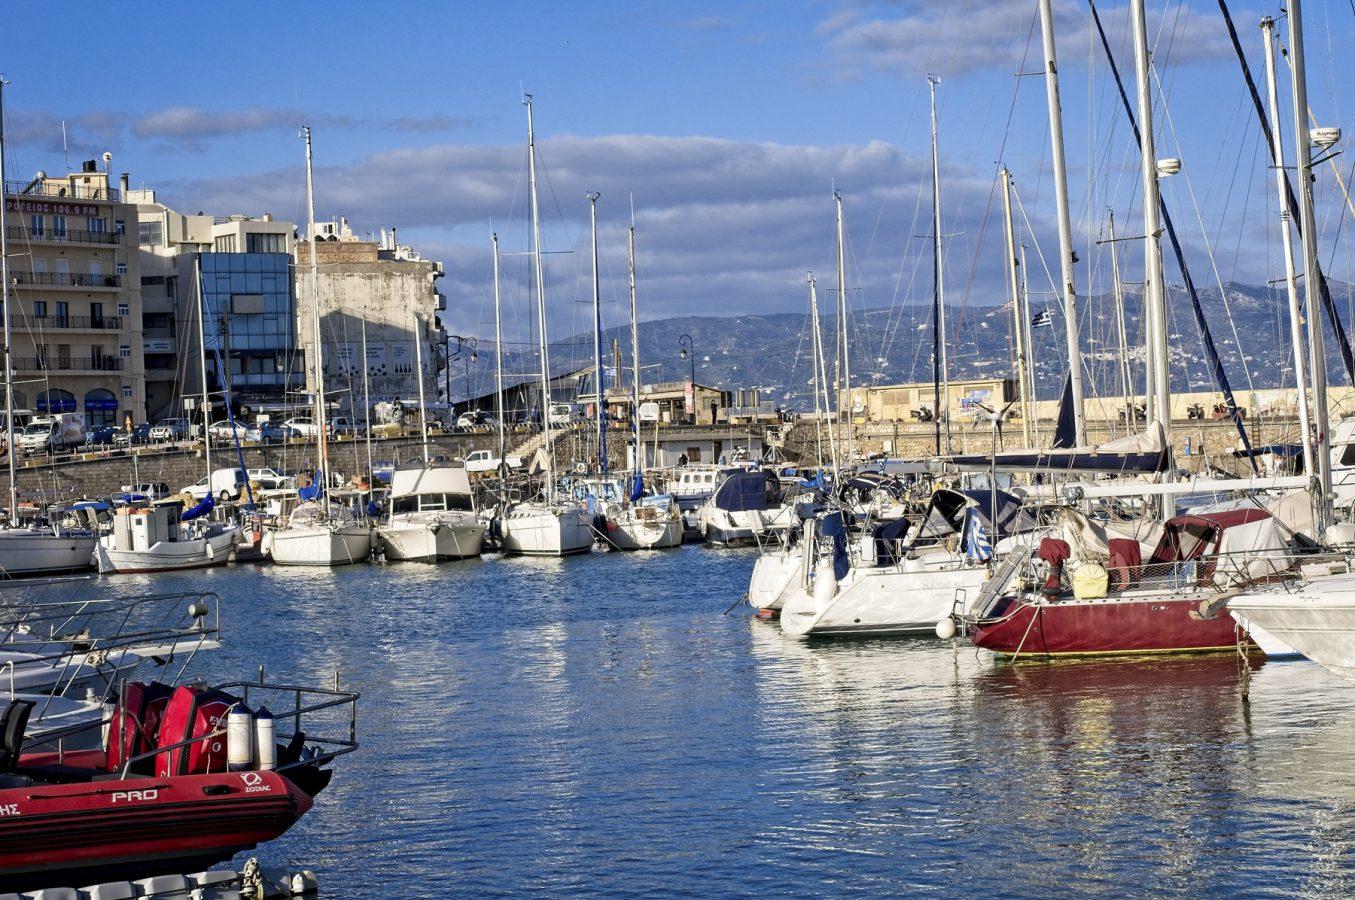 Heraklion's picturesque marina